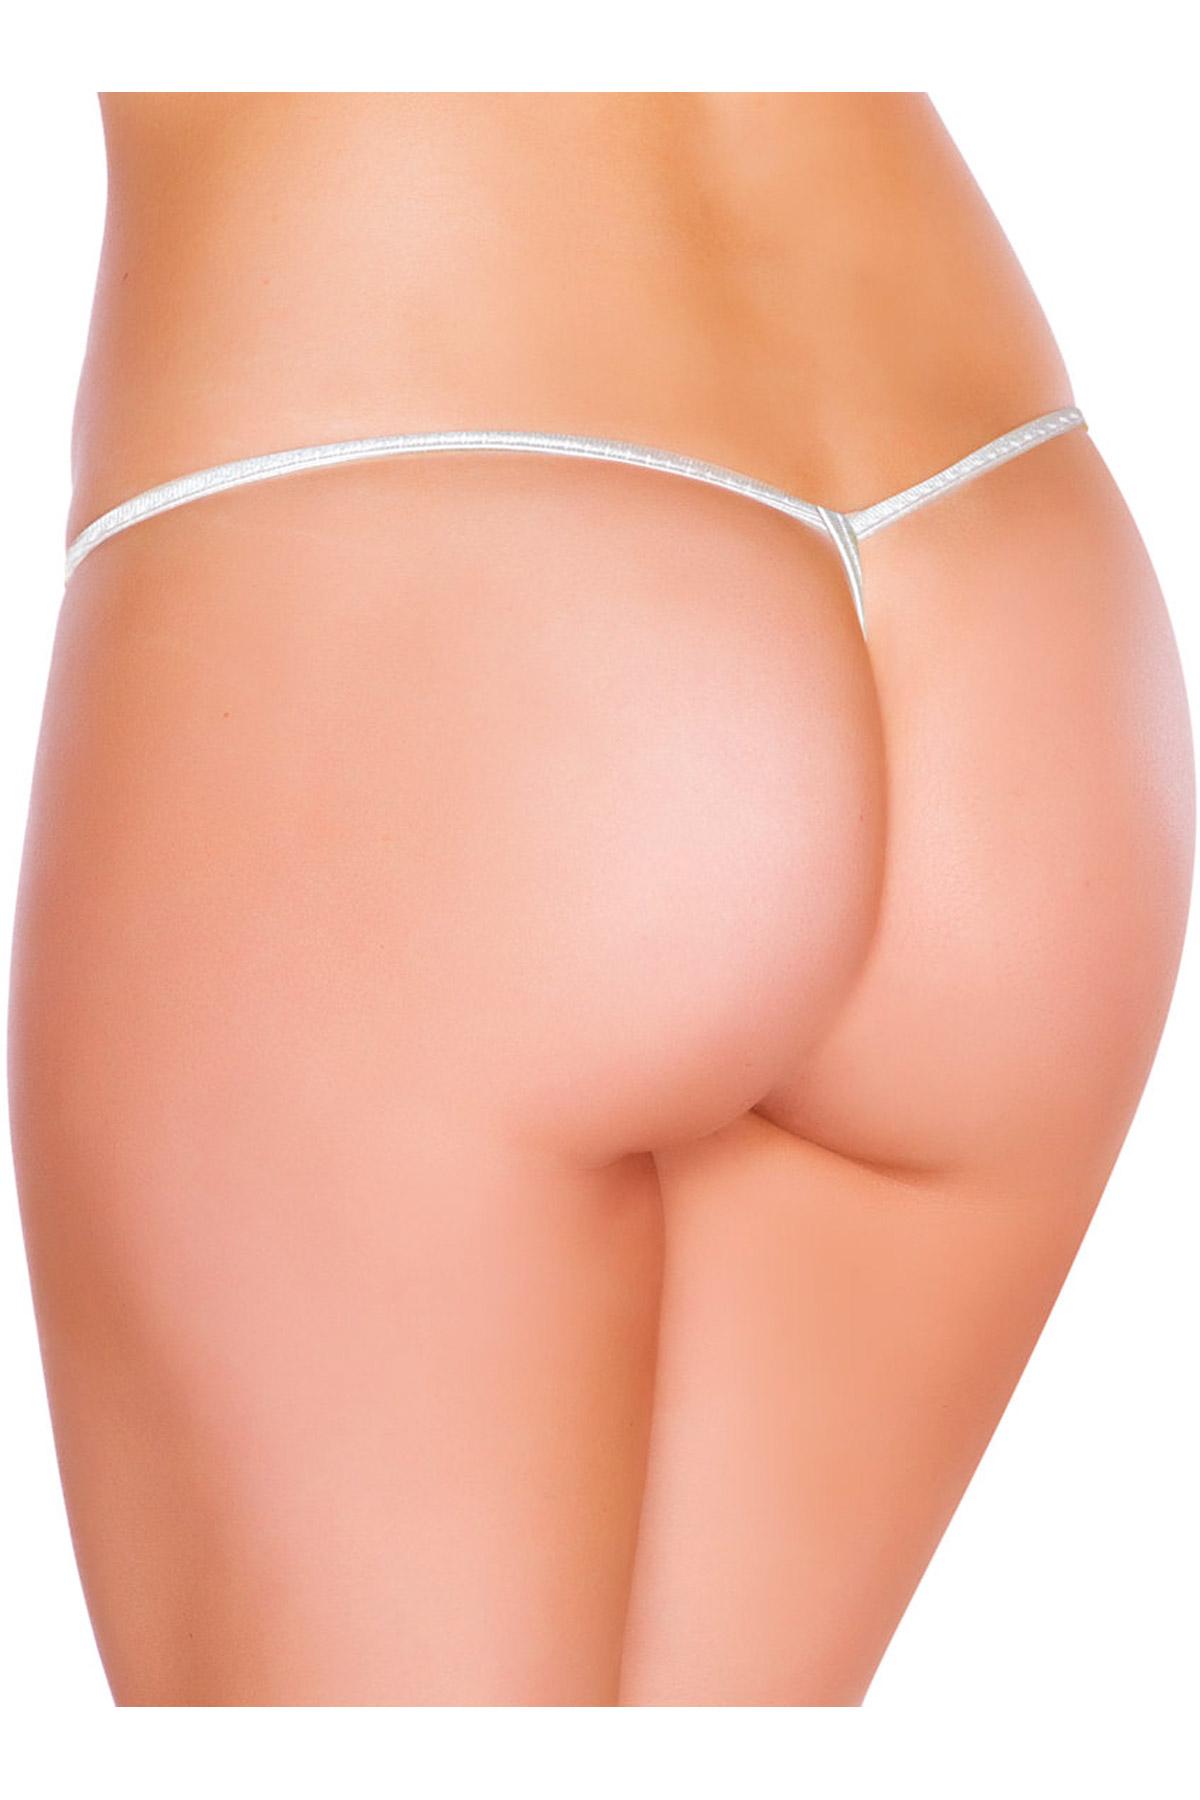 f68cd20a64ca9 Sexy Metallic Tear Drop Bottom Panties Lingerie Women